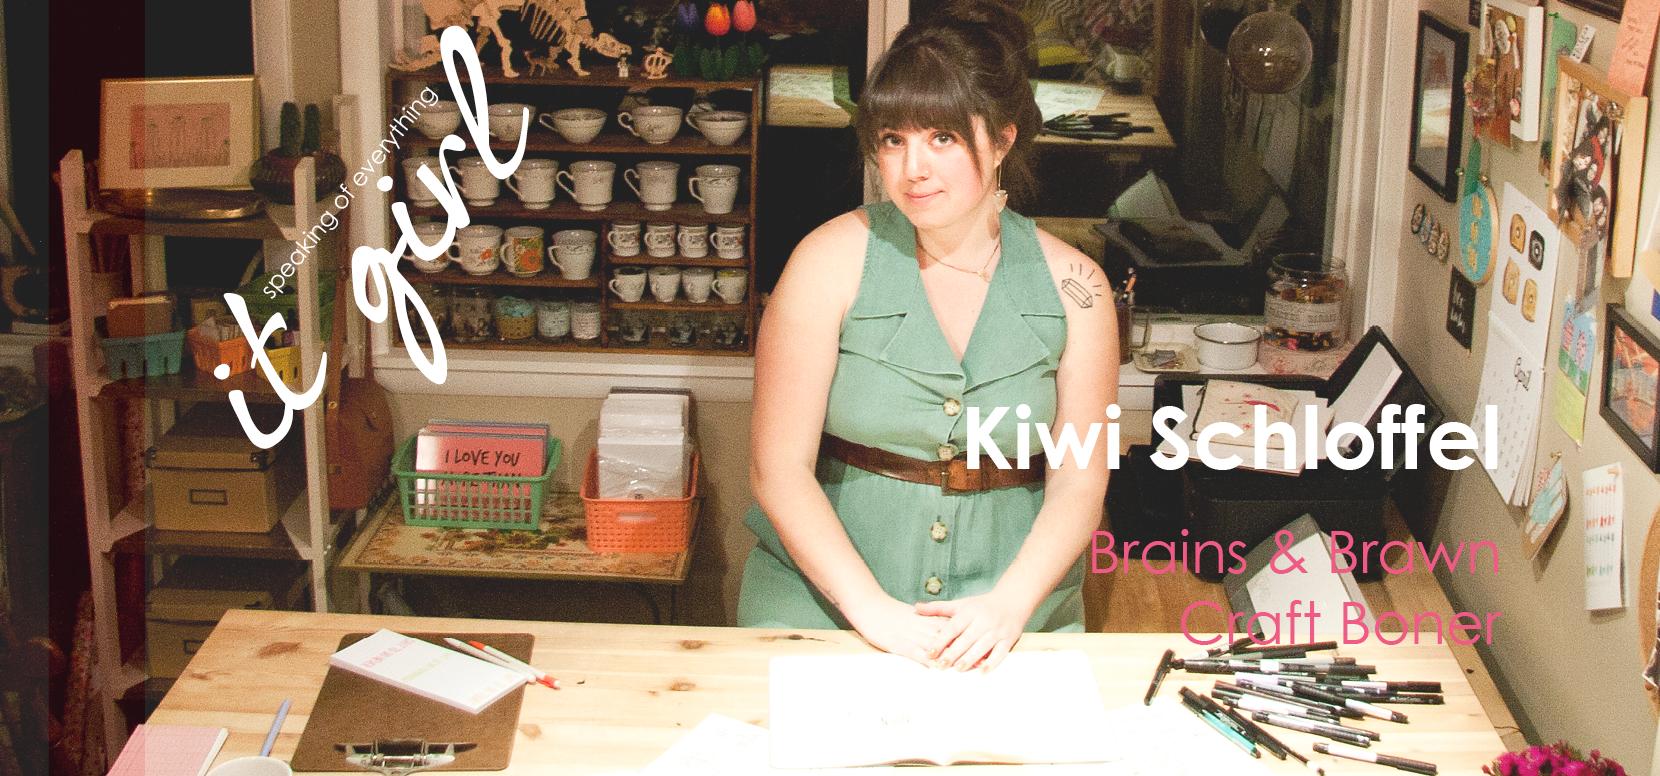 It Girl Graphic Sq- Kiwi website